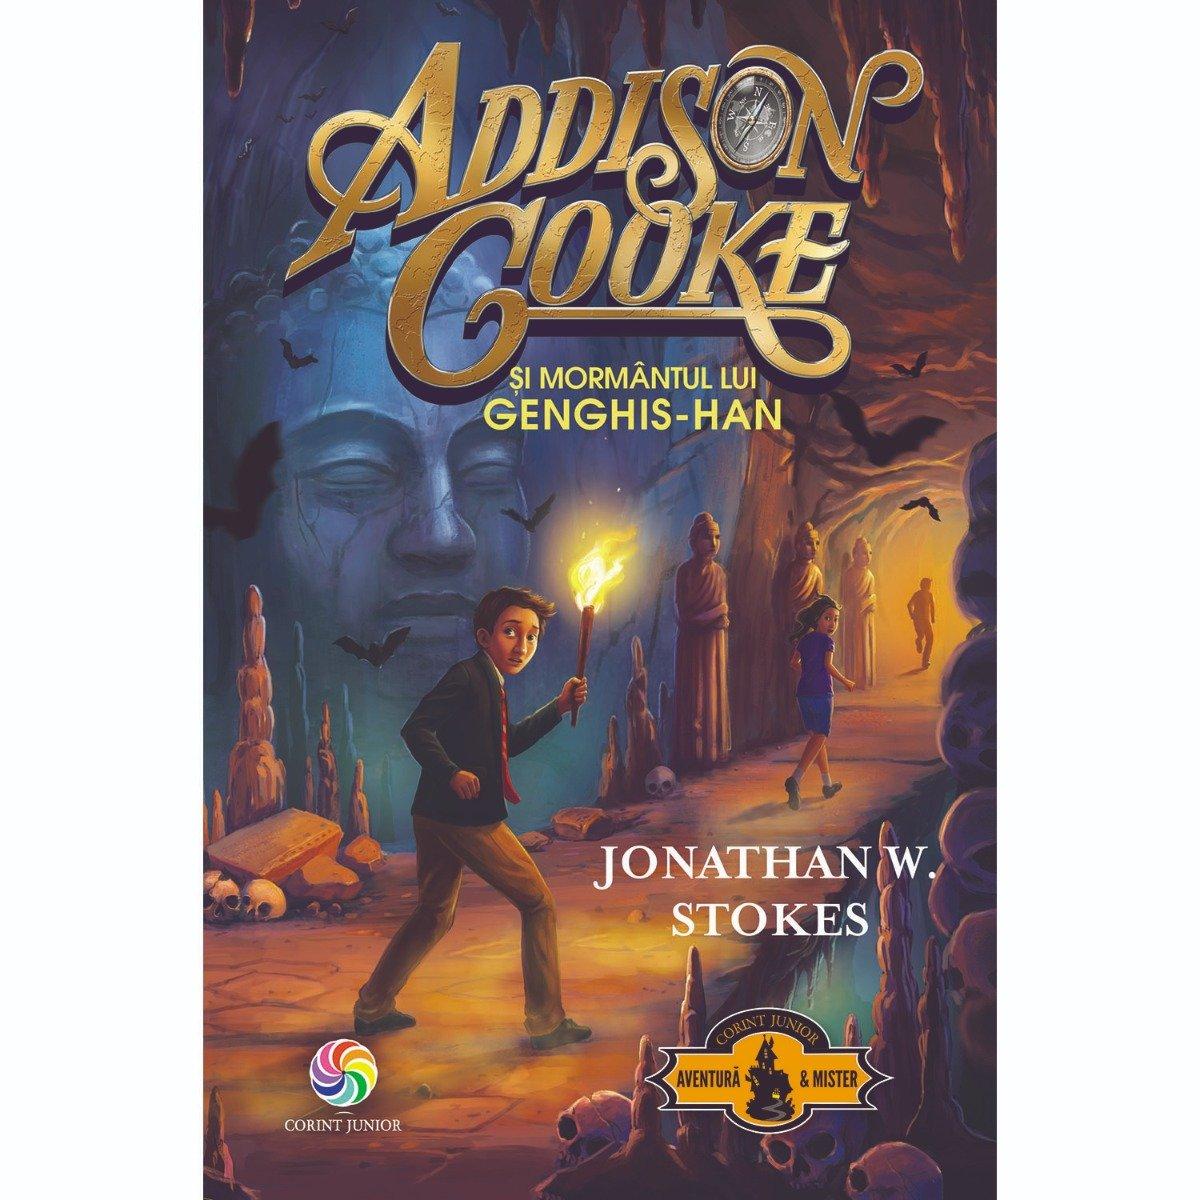 Carte Editura Corint, Addison Cooke si mormantul lui Genghis-Han vol.2, Jonathan W. Stokes